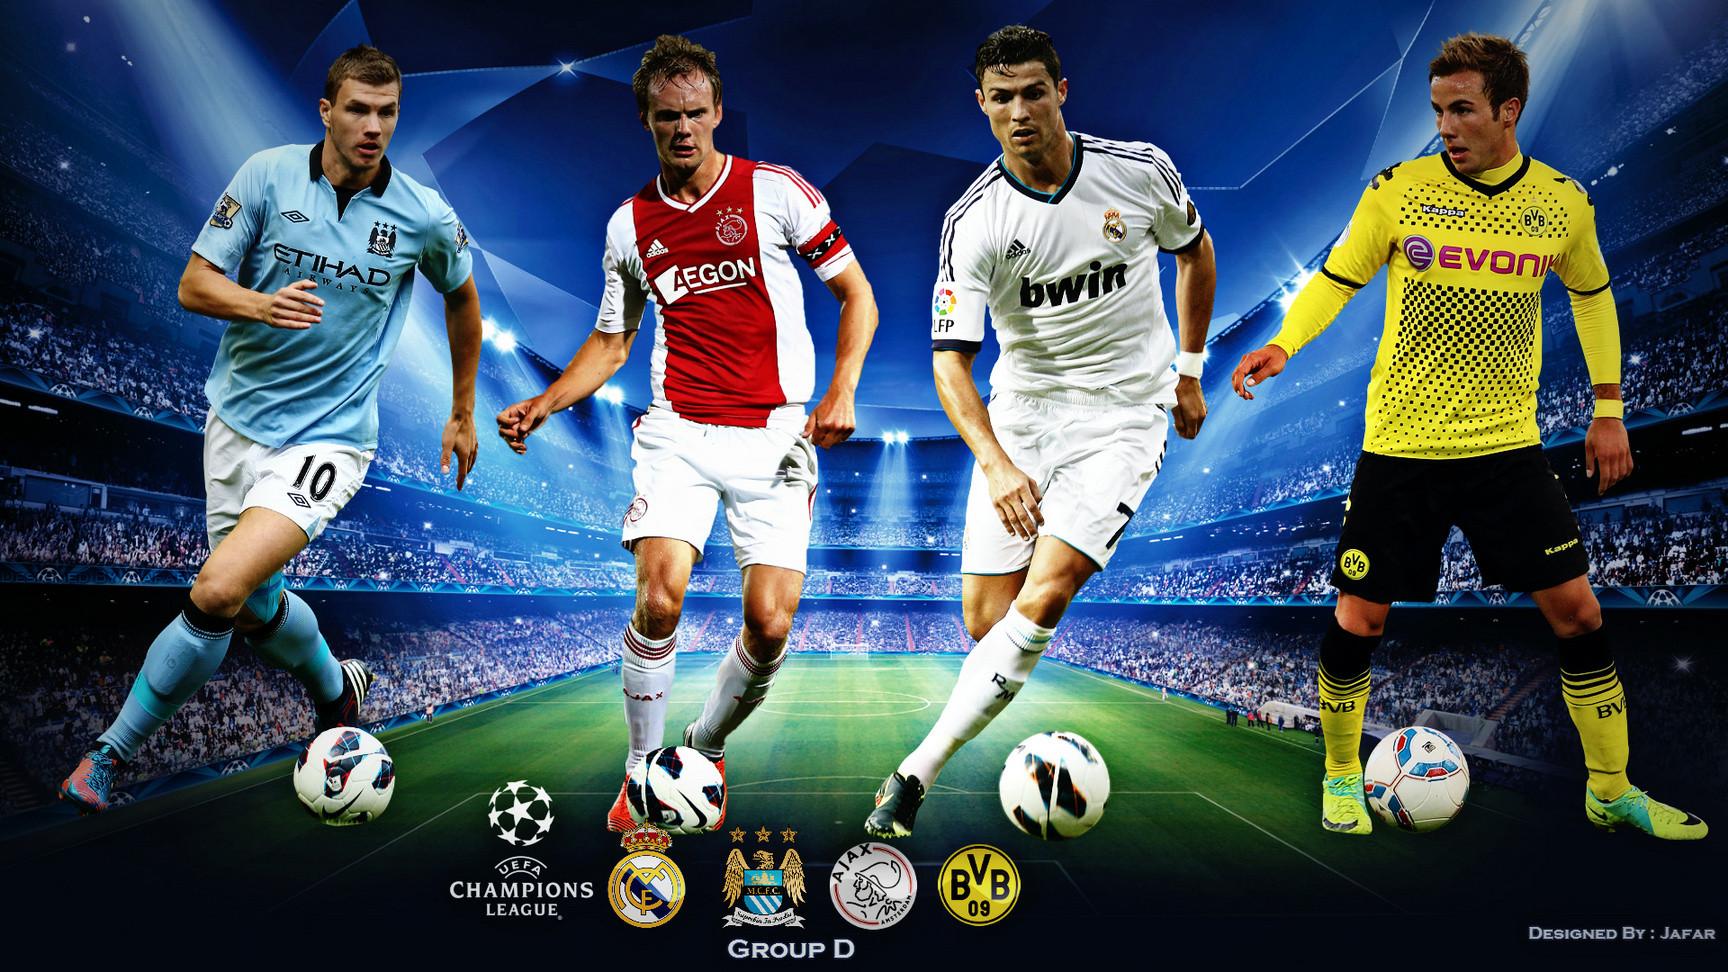 UEFA: UEFA Champions League Wallpaper HD